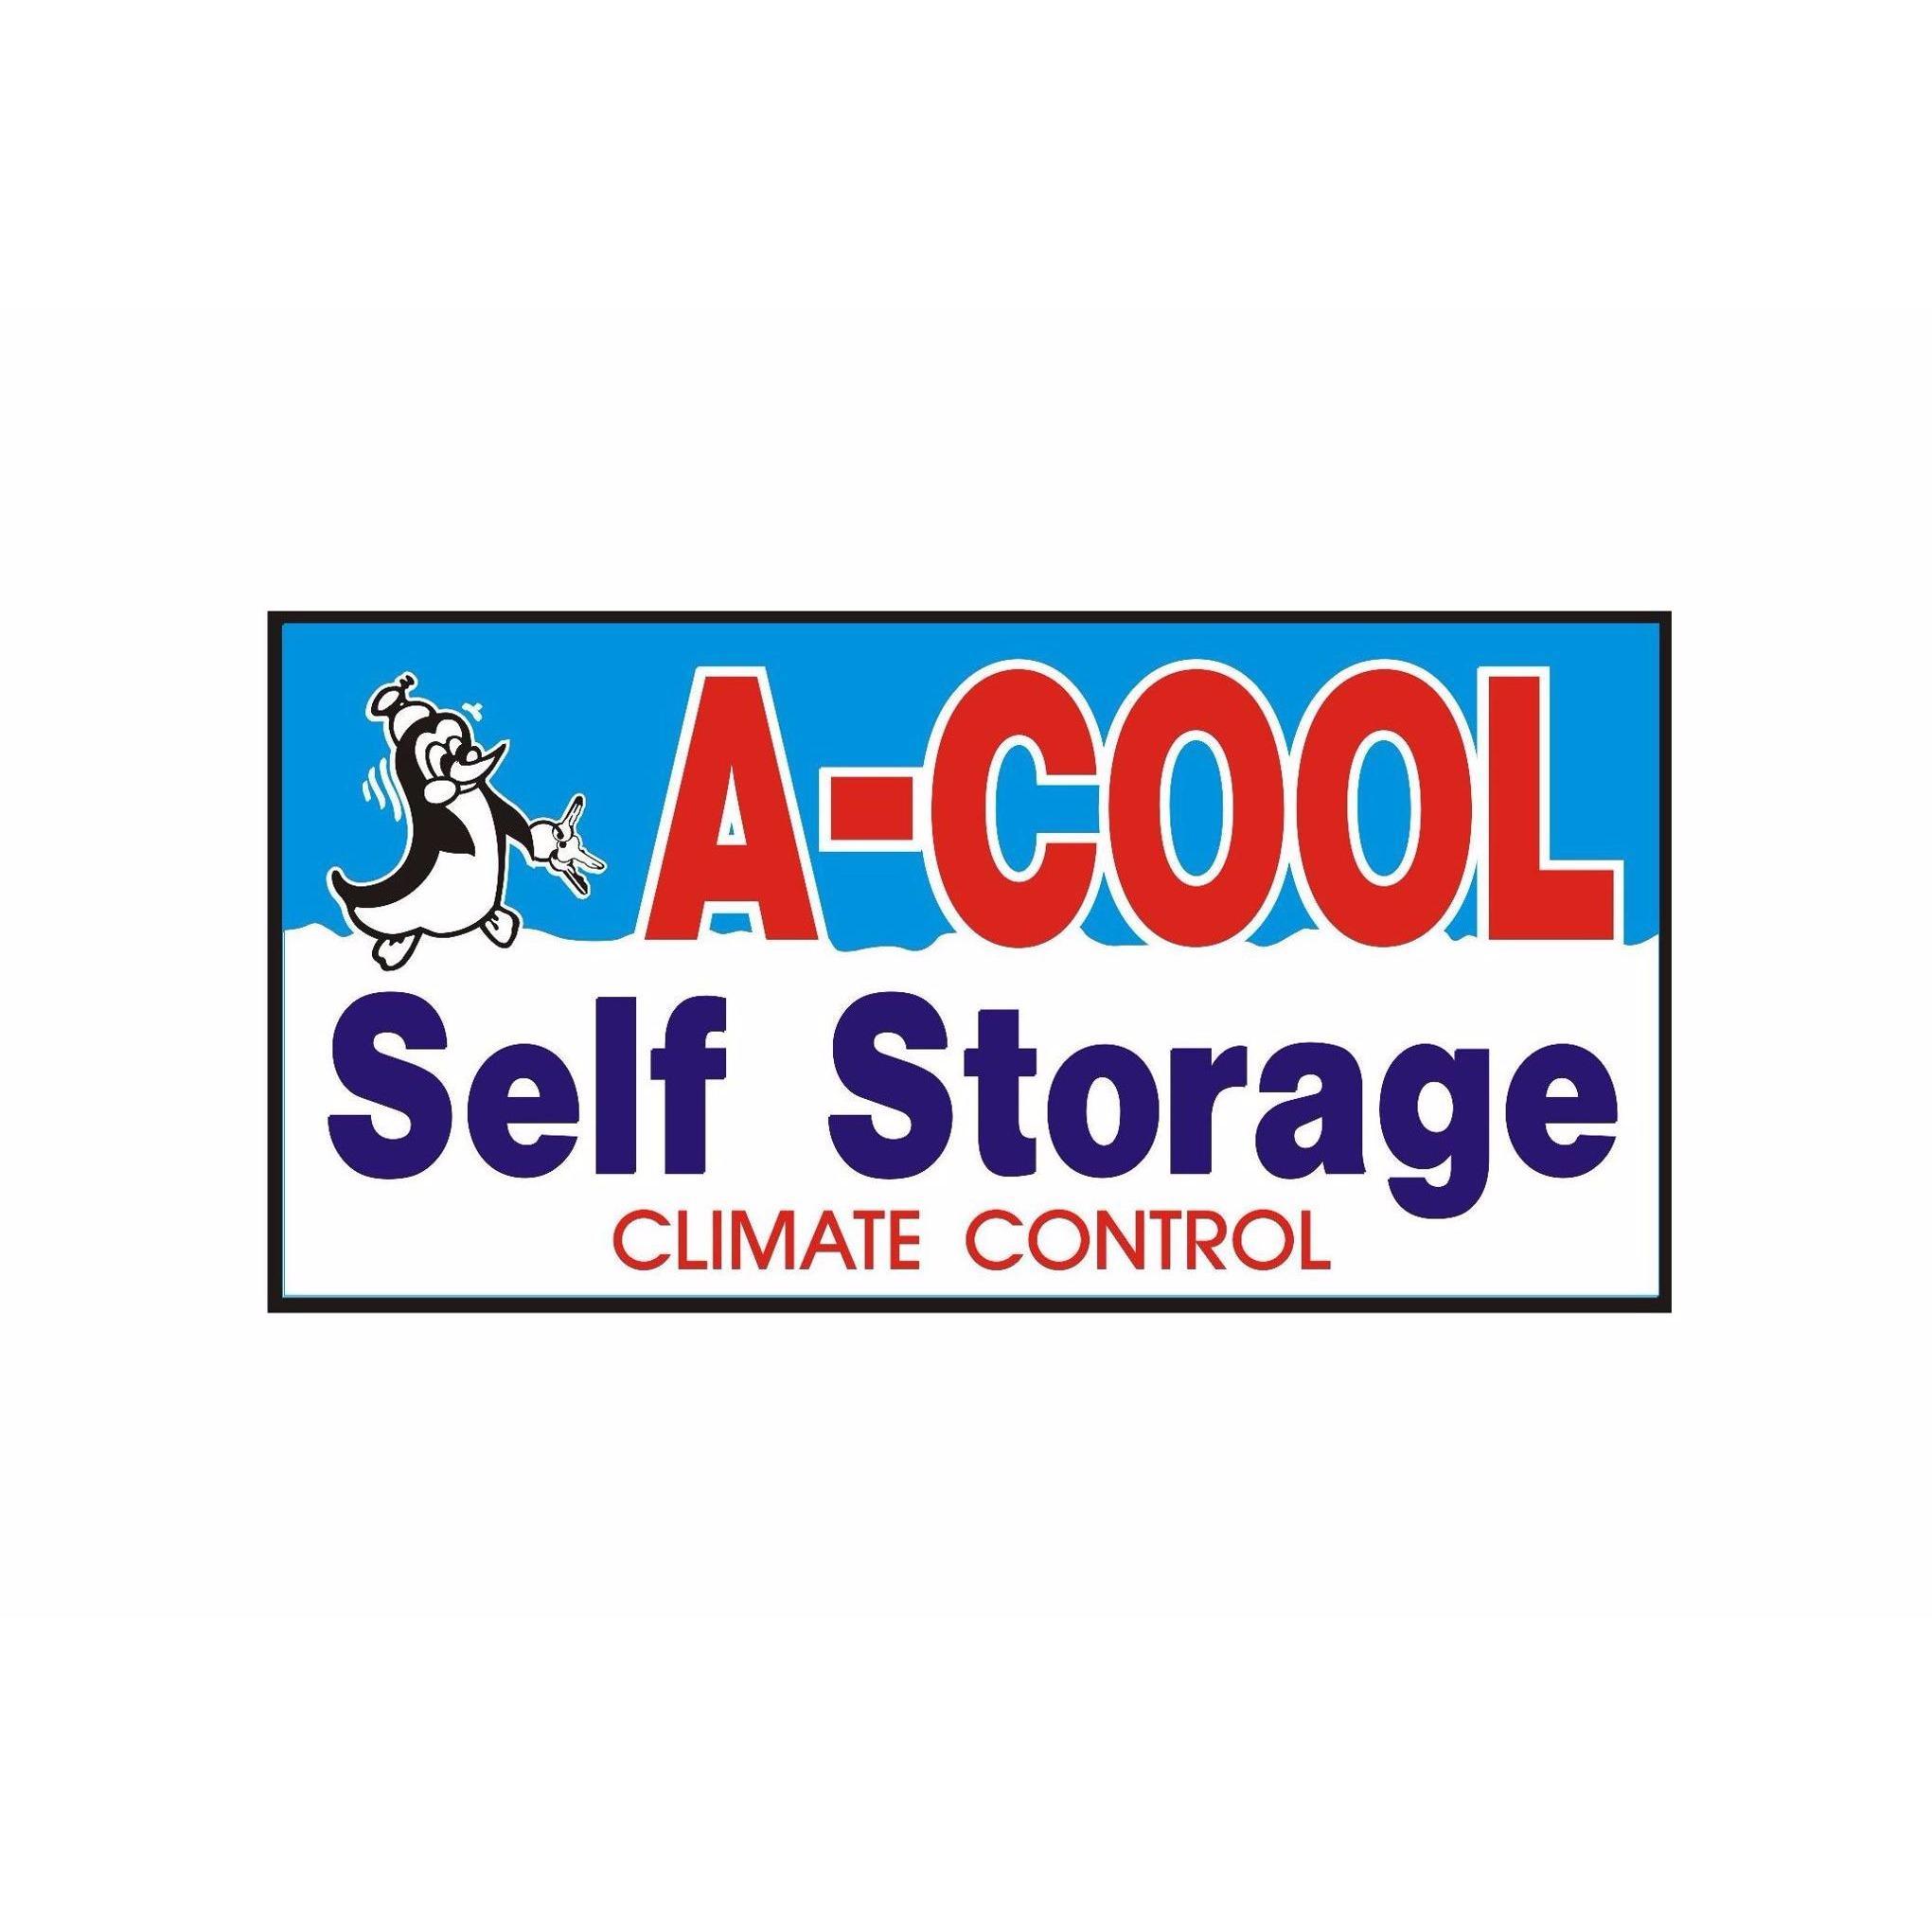 A-Cool Self Storage